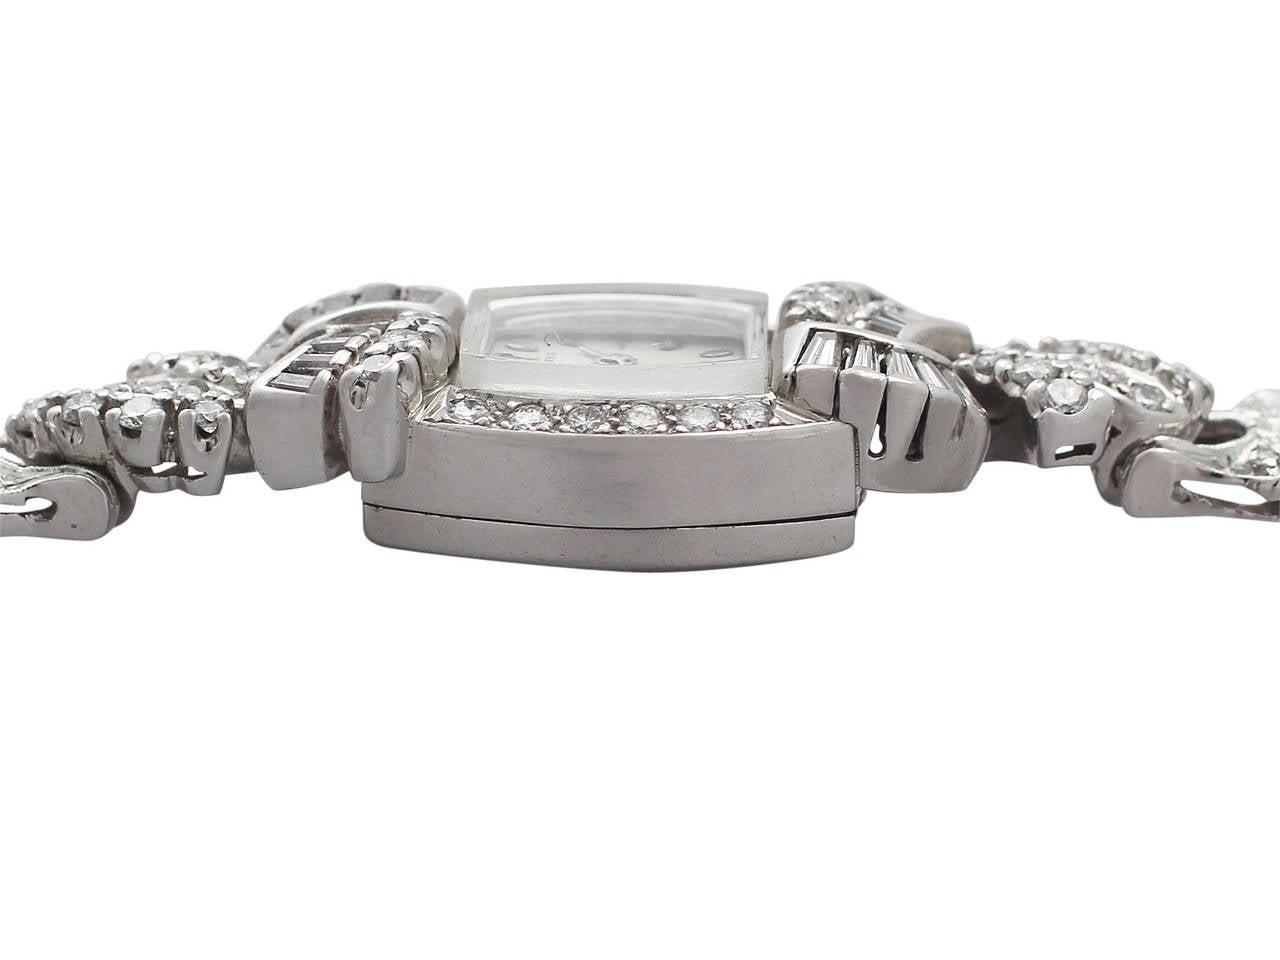 1950s 2.26 carat Diamond Platinum and White Gold Longines Cocktail Watch 3